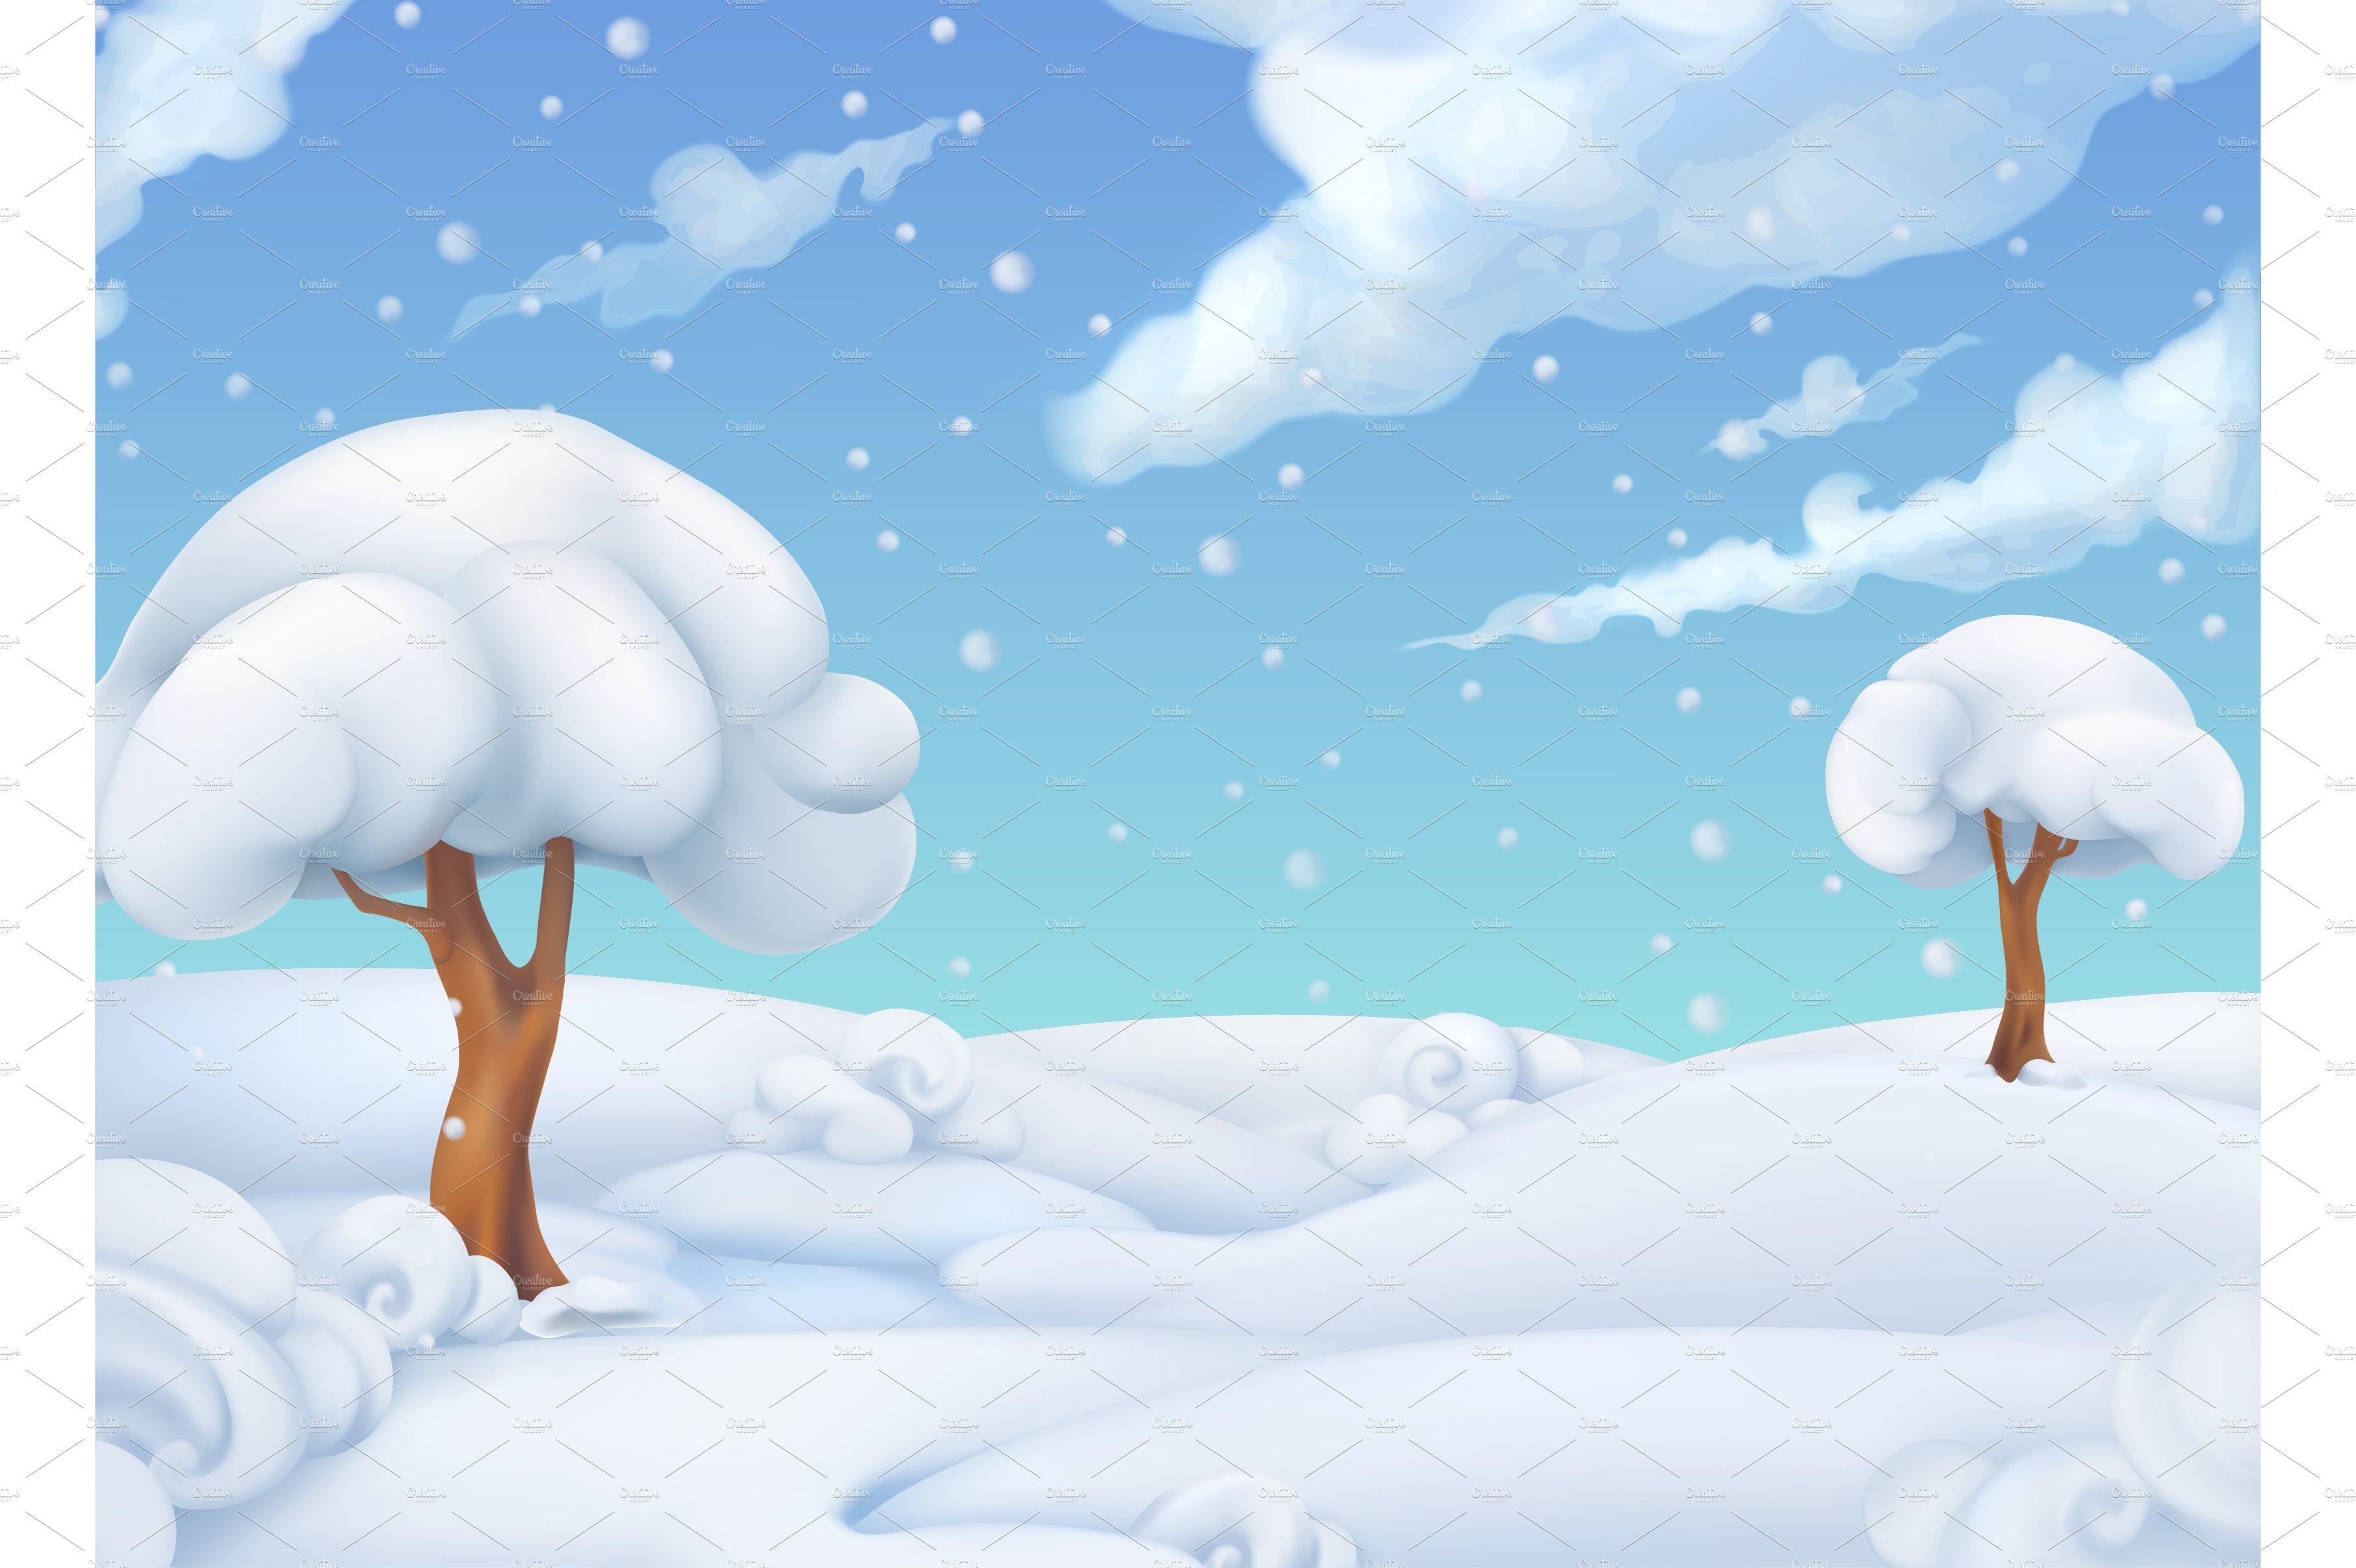 Winter Landscape Vector Illustration Illustrations